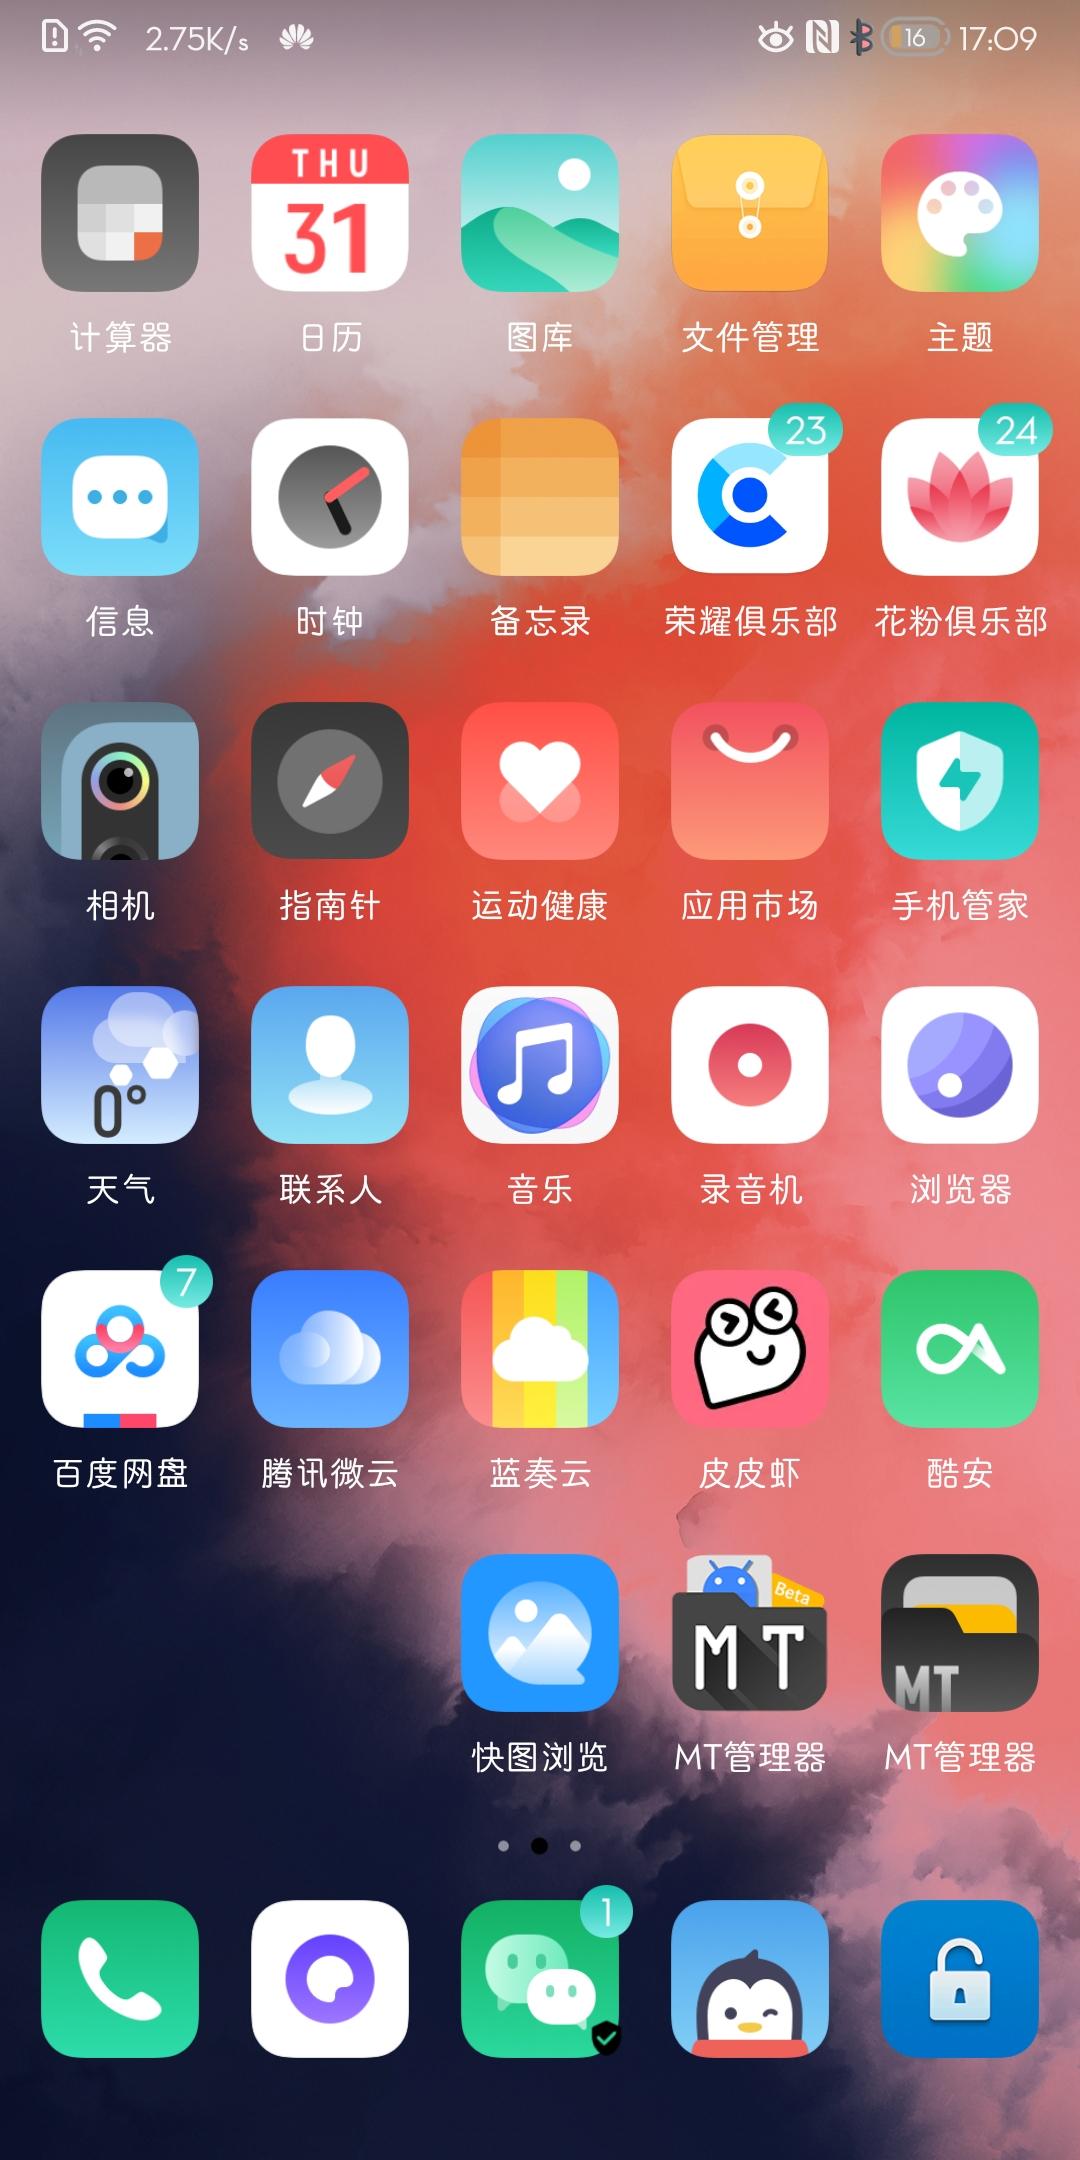 Screenshot_20201231_170927_com.huawei.android.lau.jpg